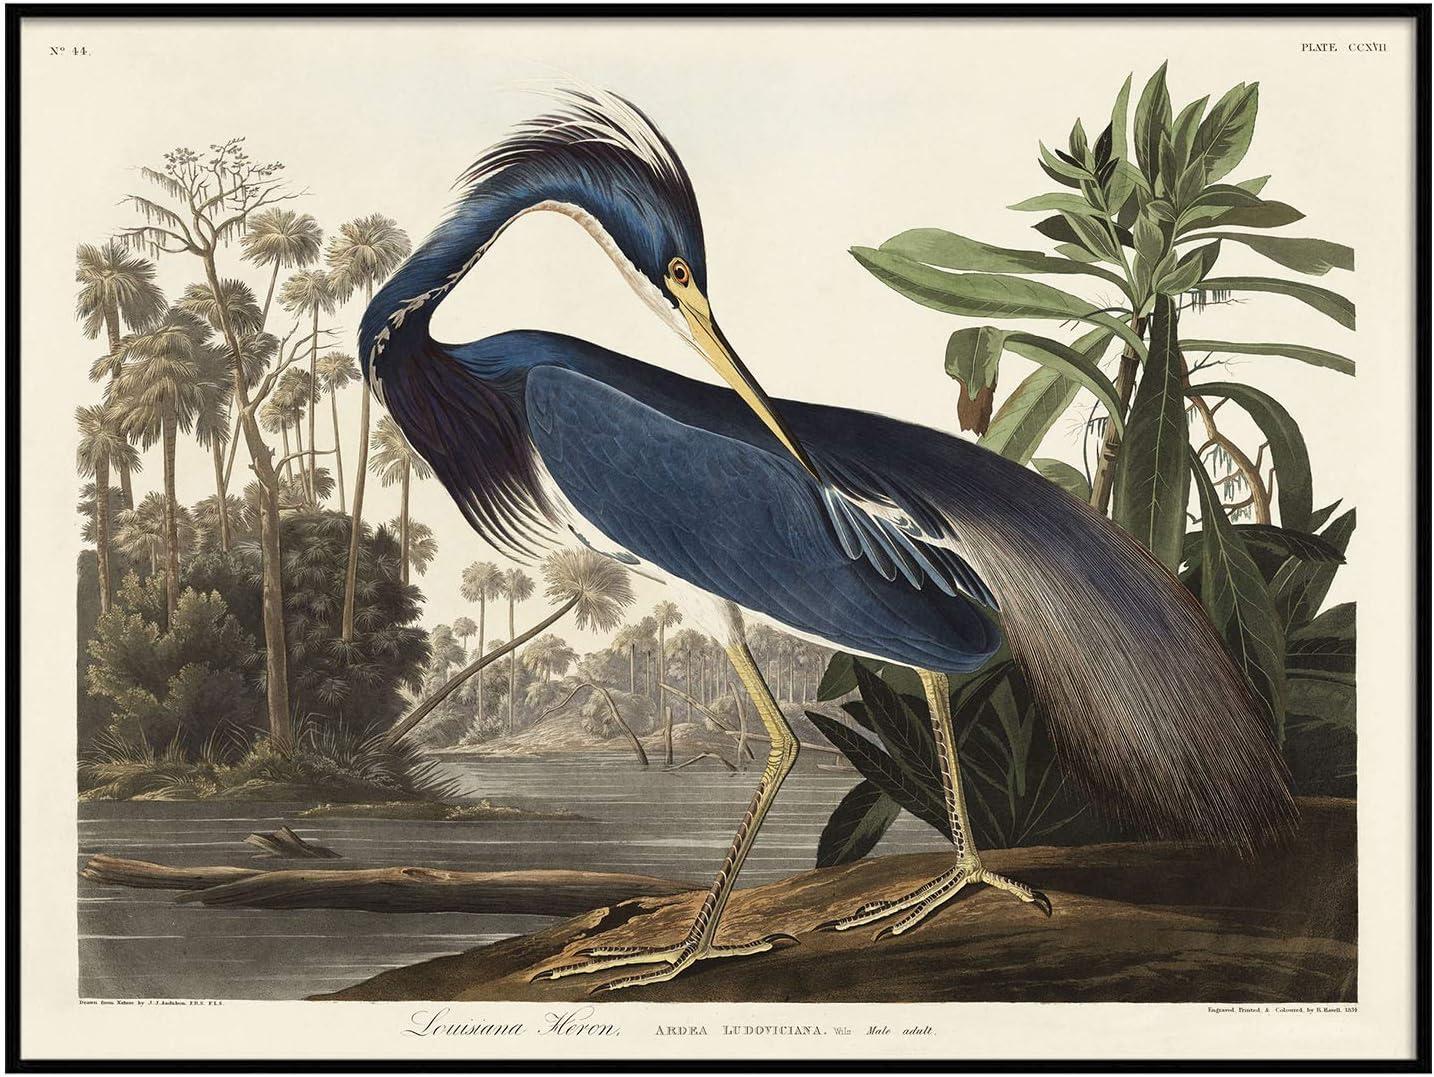 Detroit Mall Louisiana Heron Print Antique Bird Ranking TOP13 Drawing Po Painting Vintage